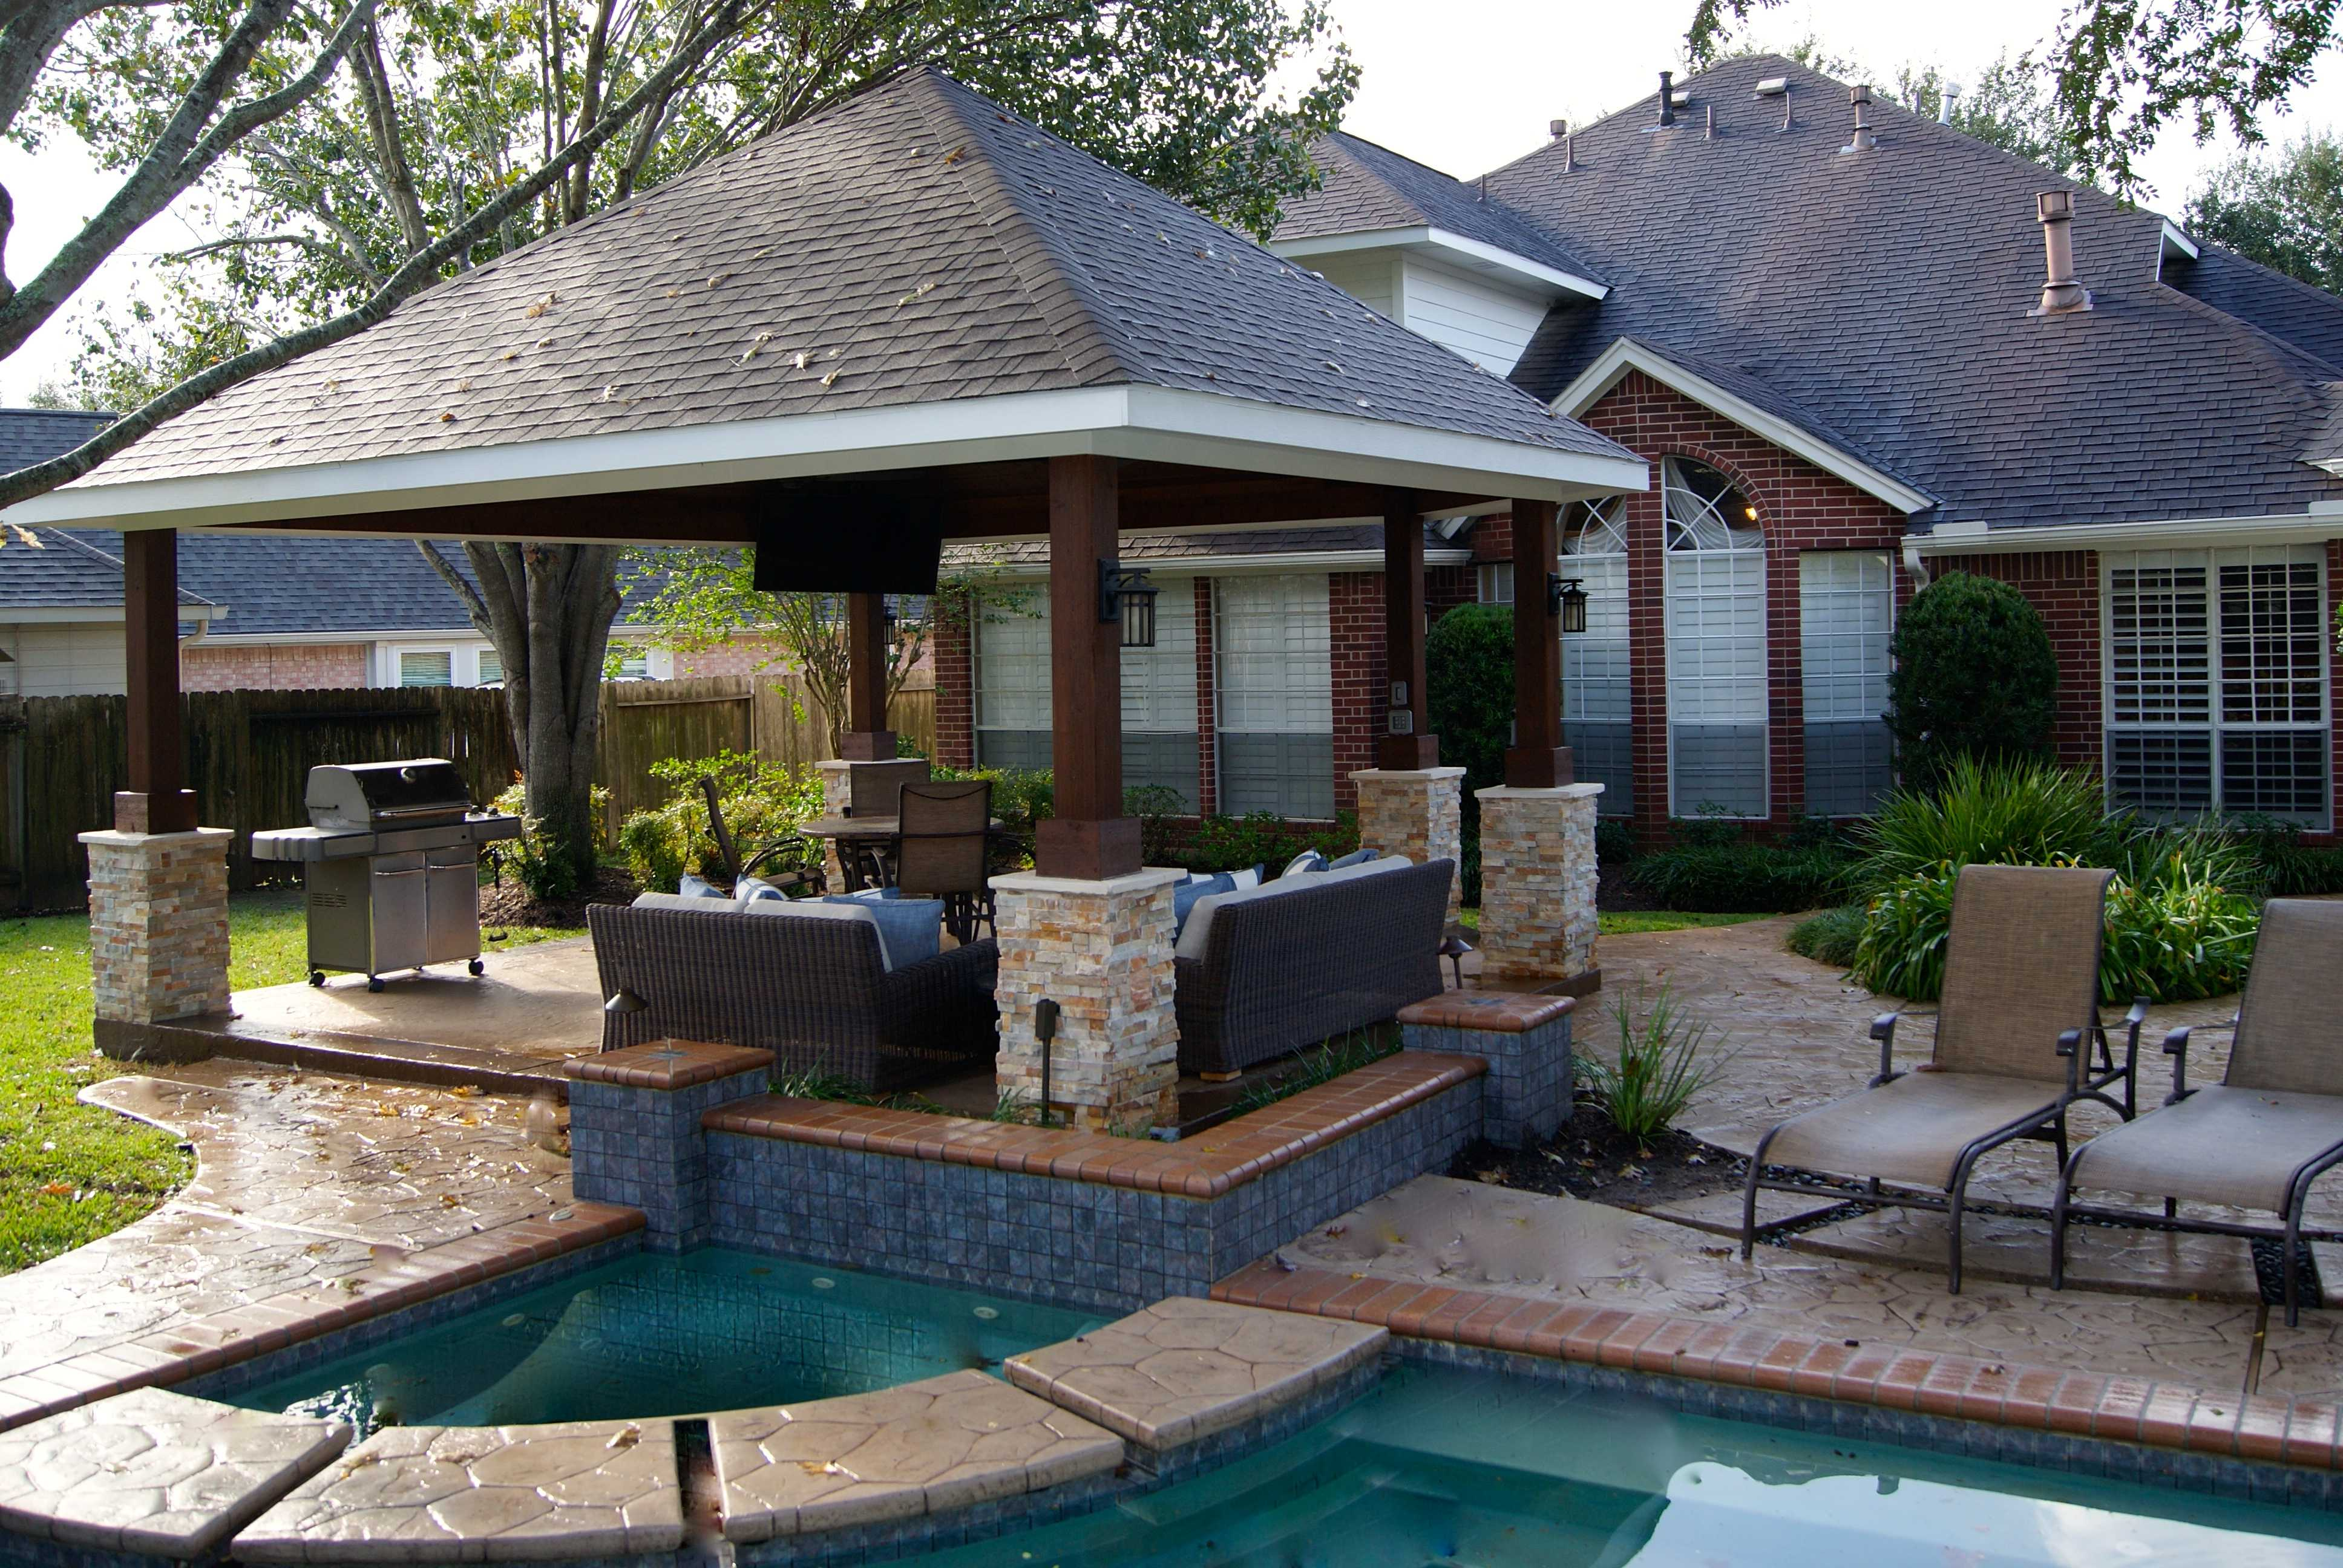 Missouri City Freestanding Patio Cover - Texas Custom Patios on Patio Cover Ideas Images id=77813